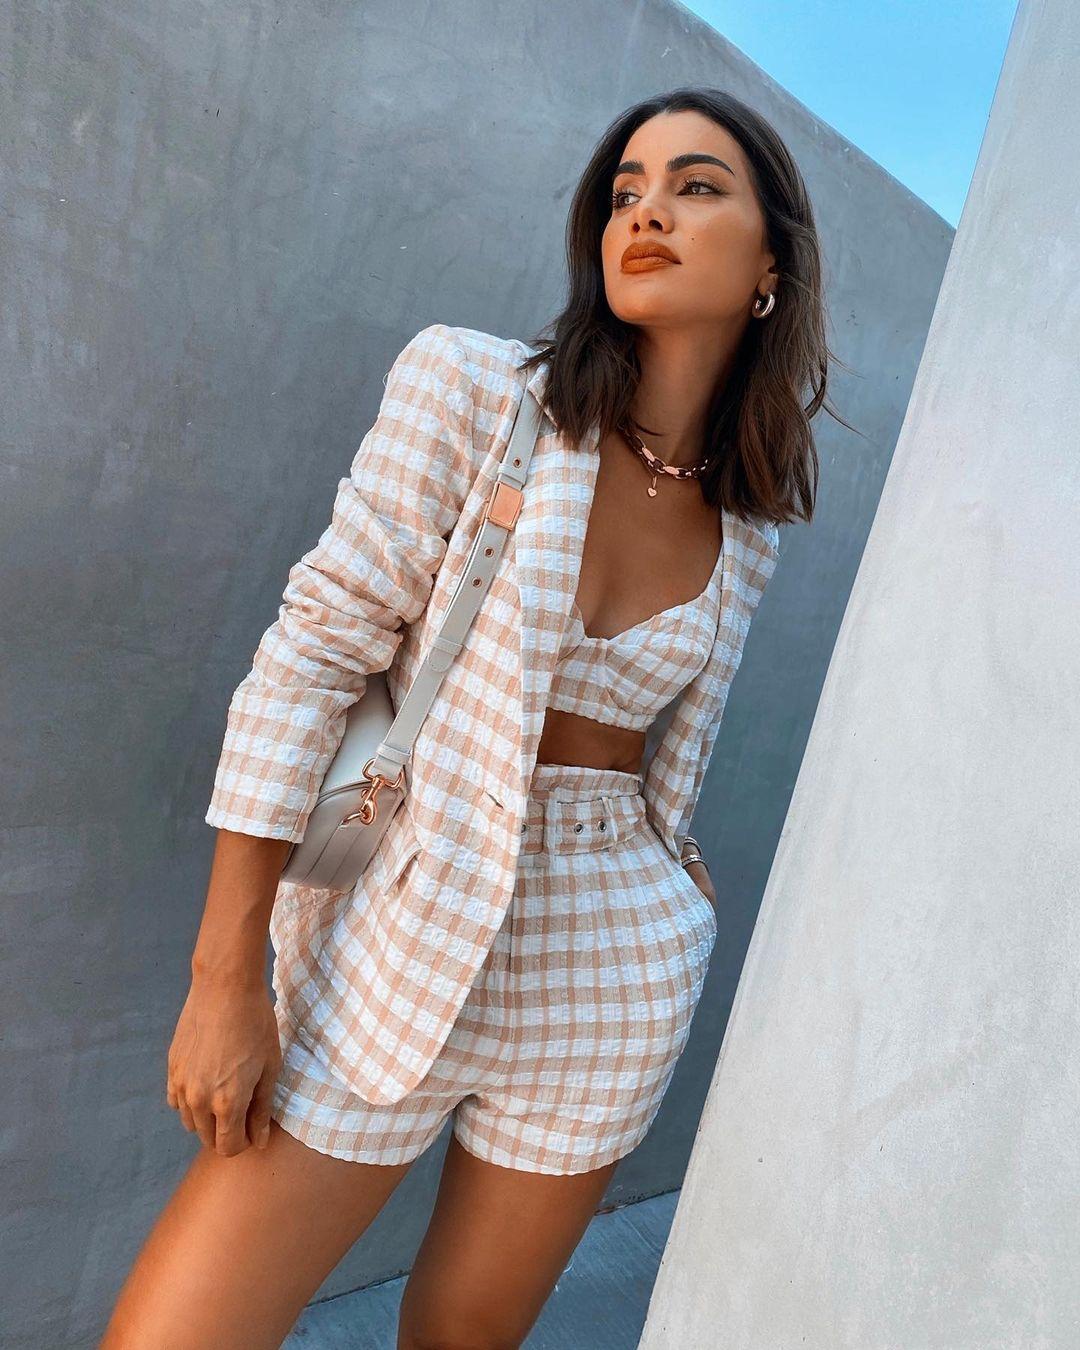 cropped xadrez 29 1 - 30 Outfits a cuadros para inspirarte y ponerte en tendencia